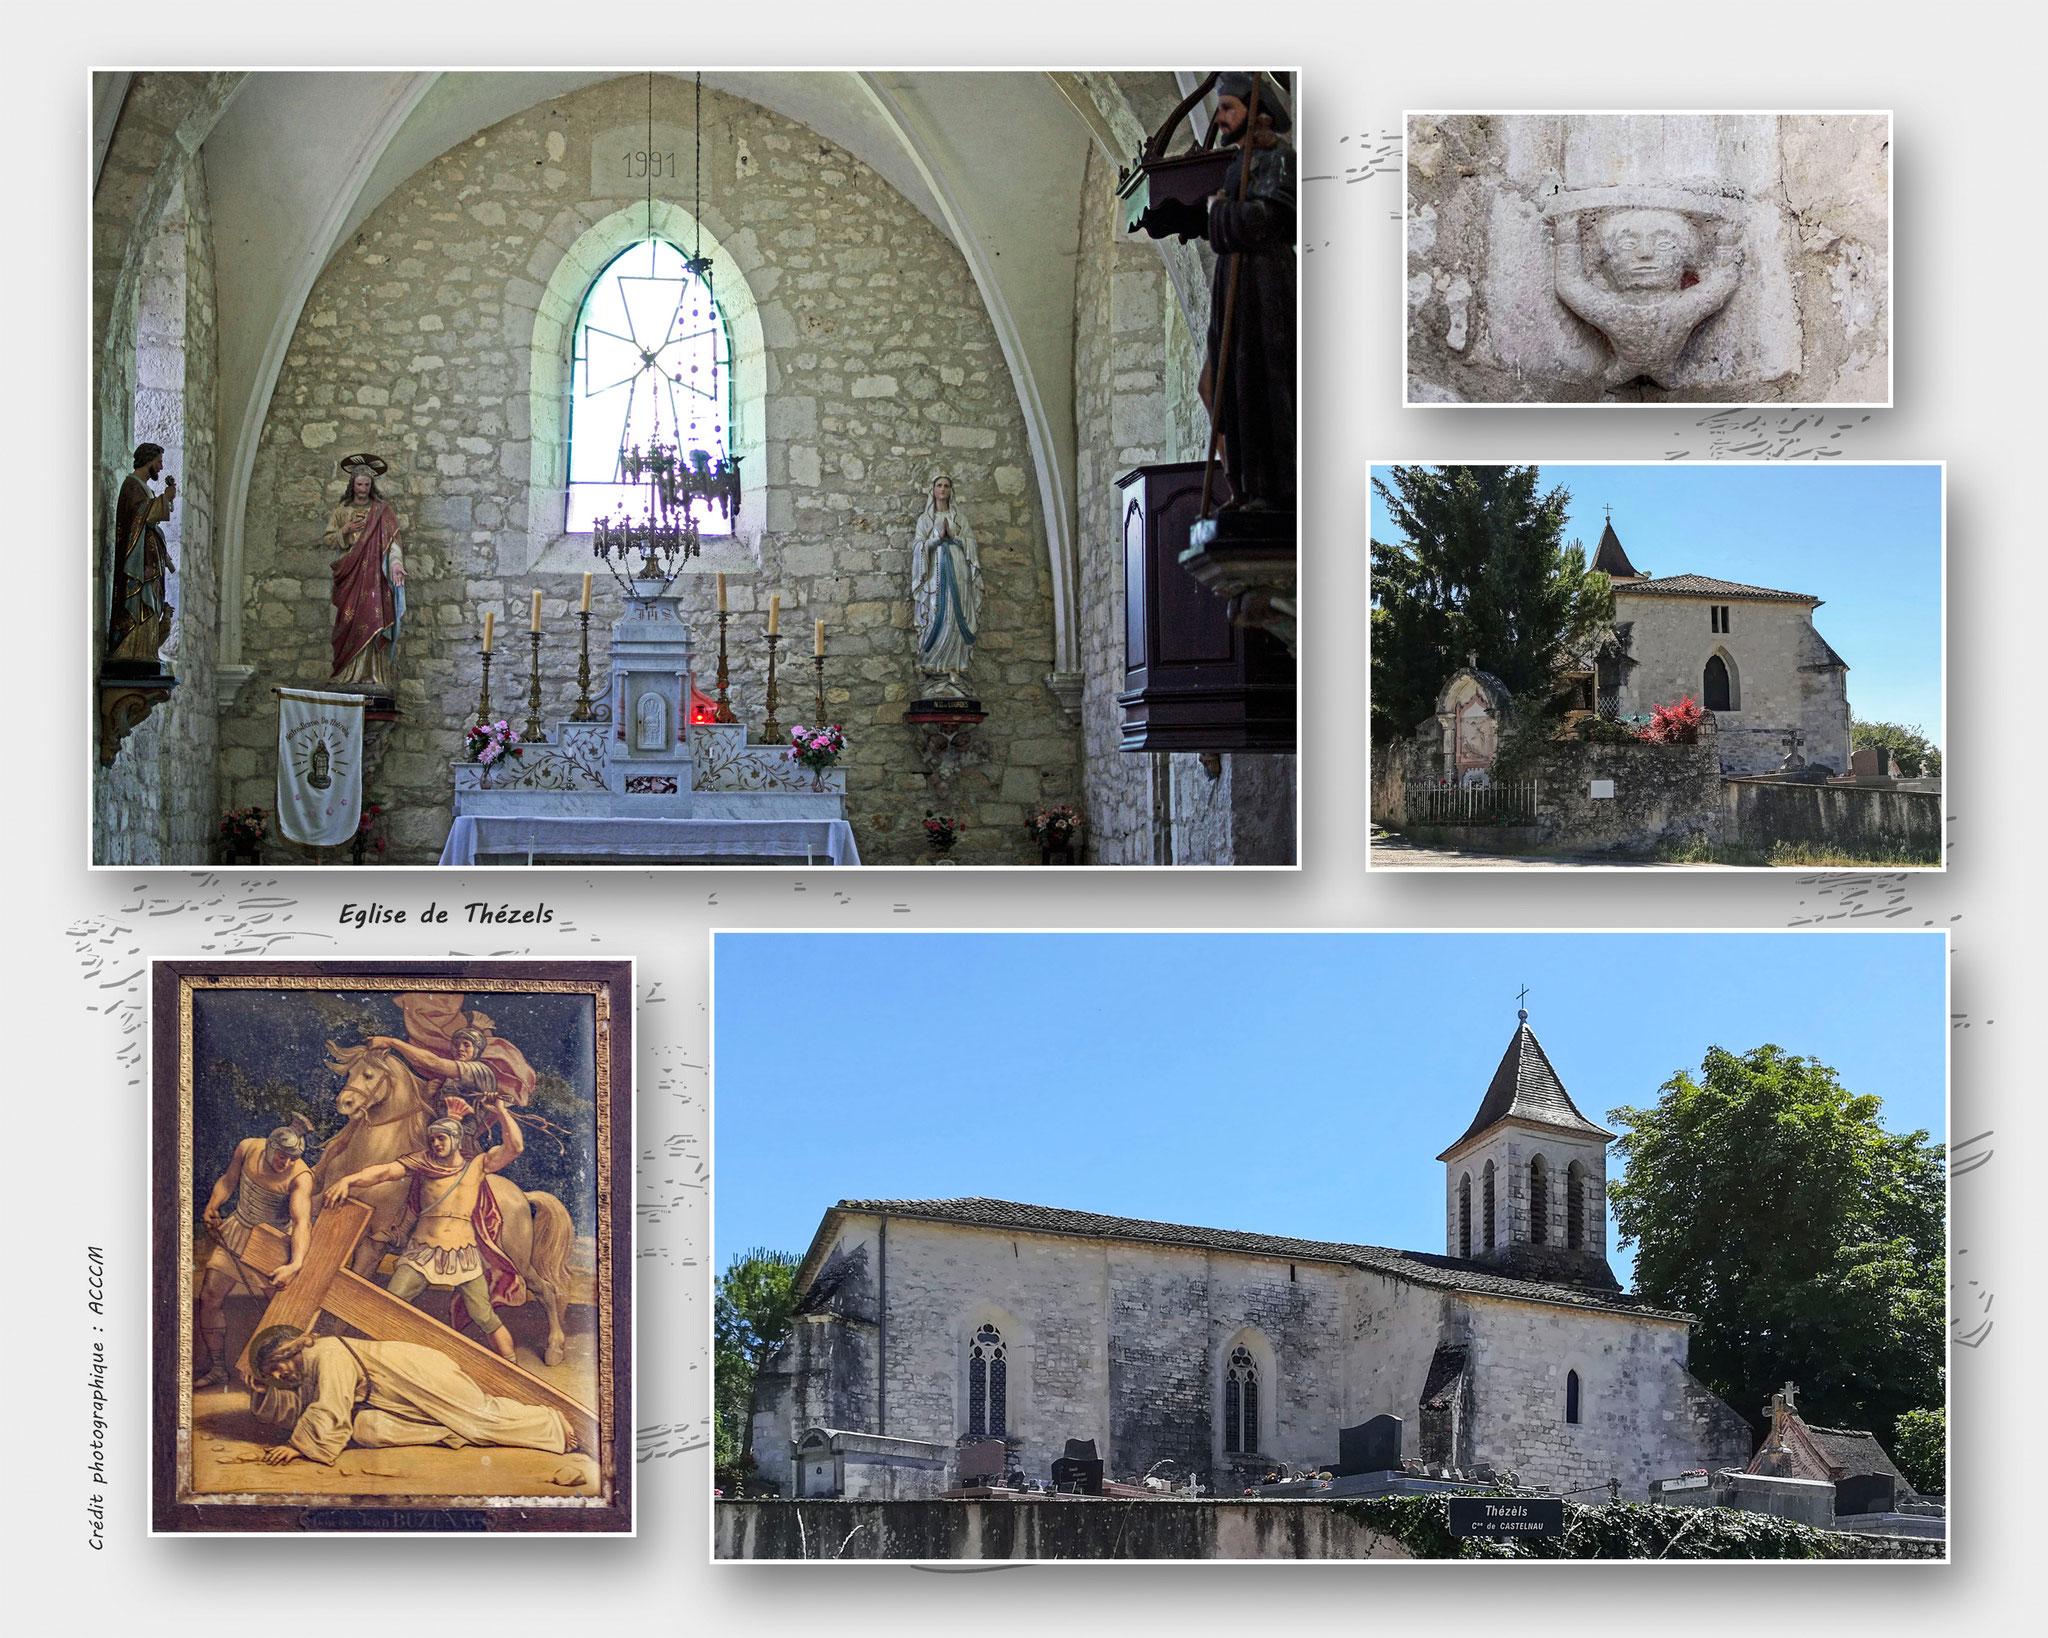 Eglise de Thézels